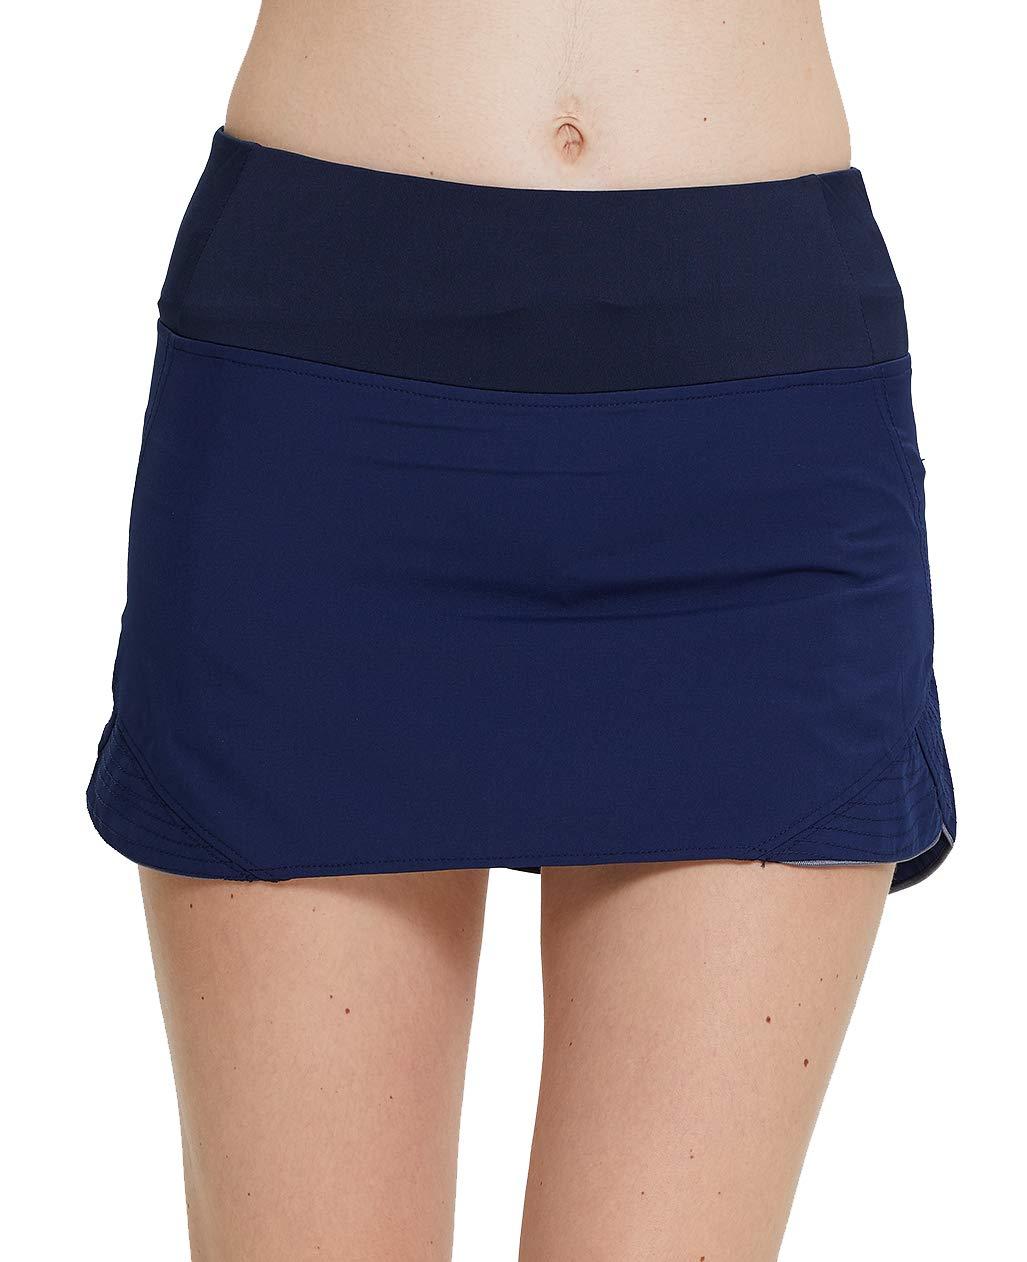 UDIY Women's Active Athletic Skort with Inner Pockets for Running Tennis Golf Badminton Workout, Navy